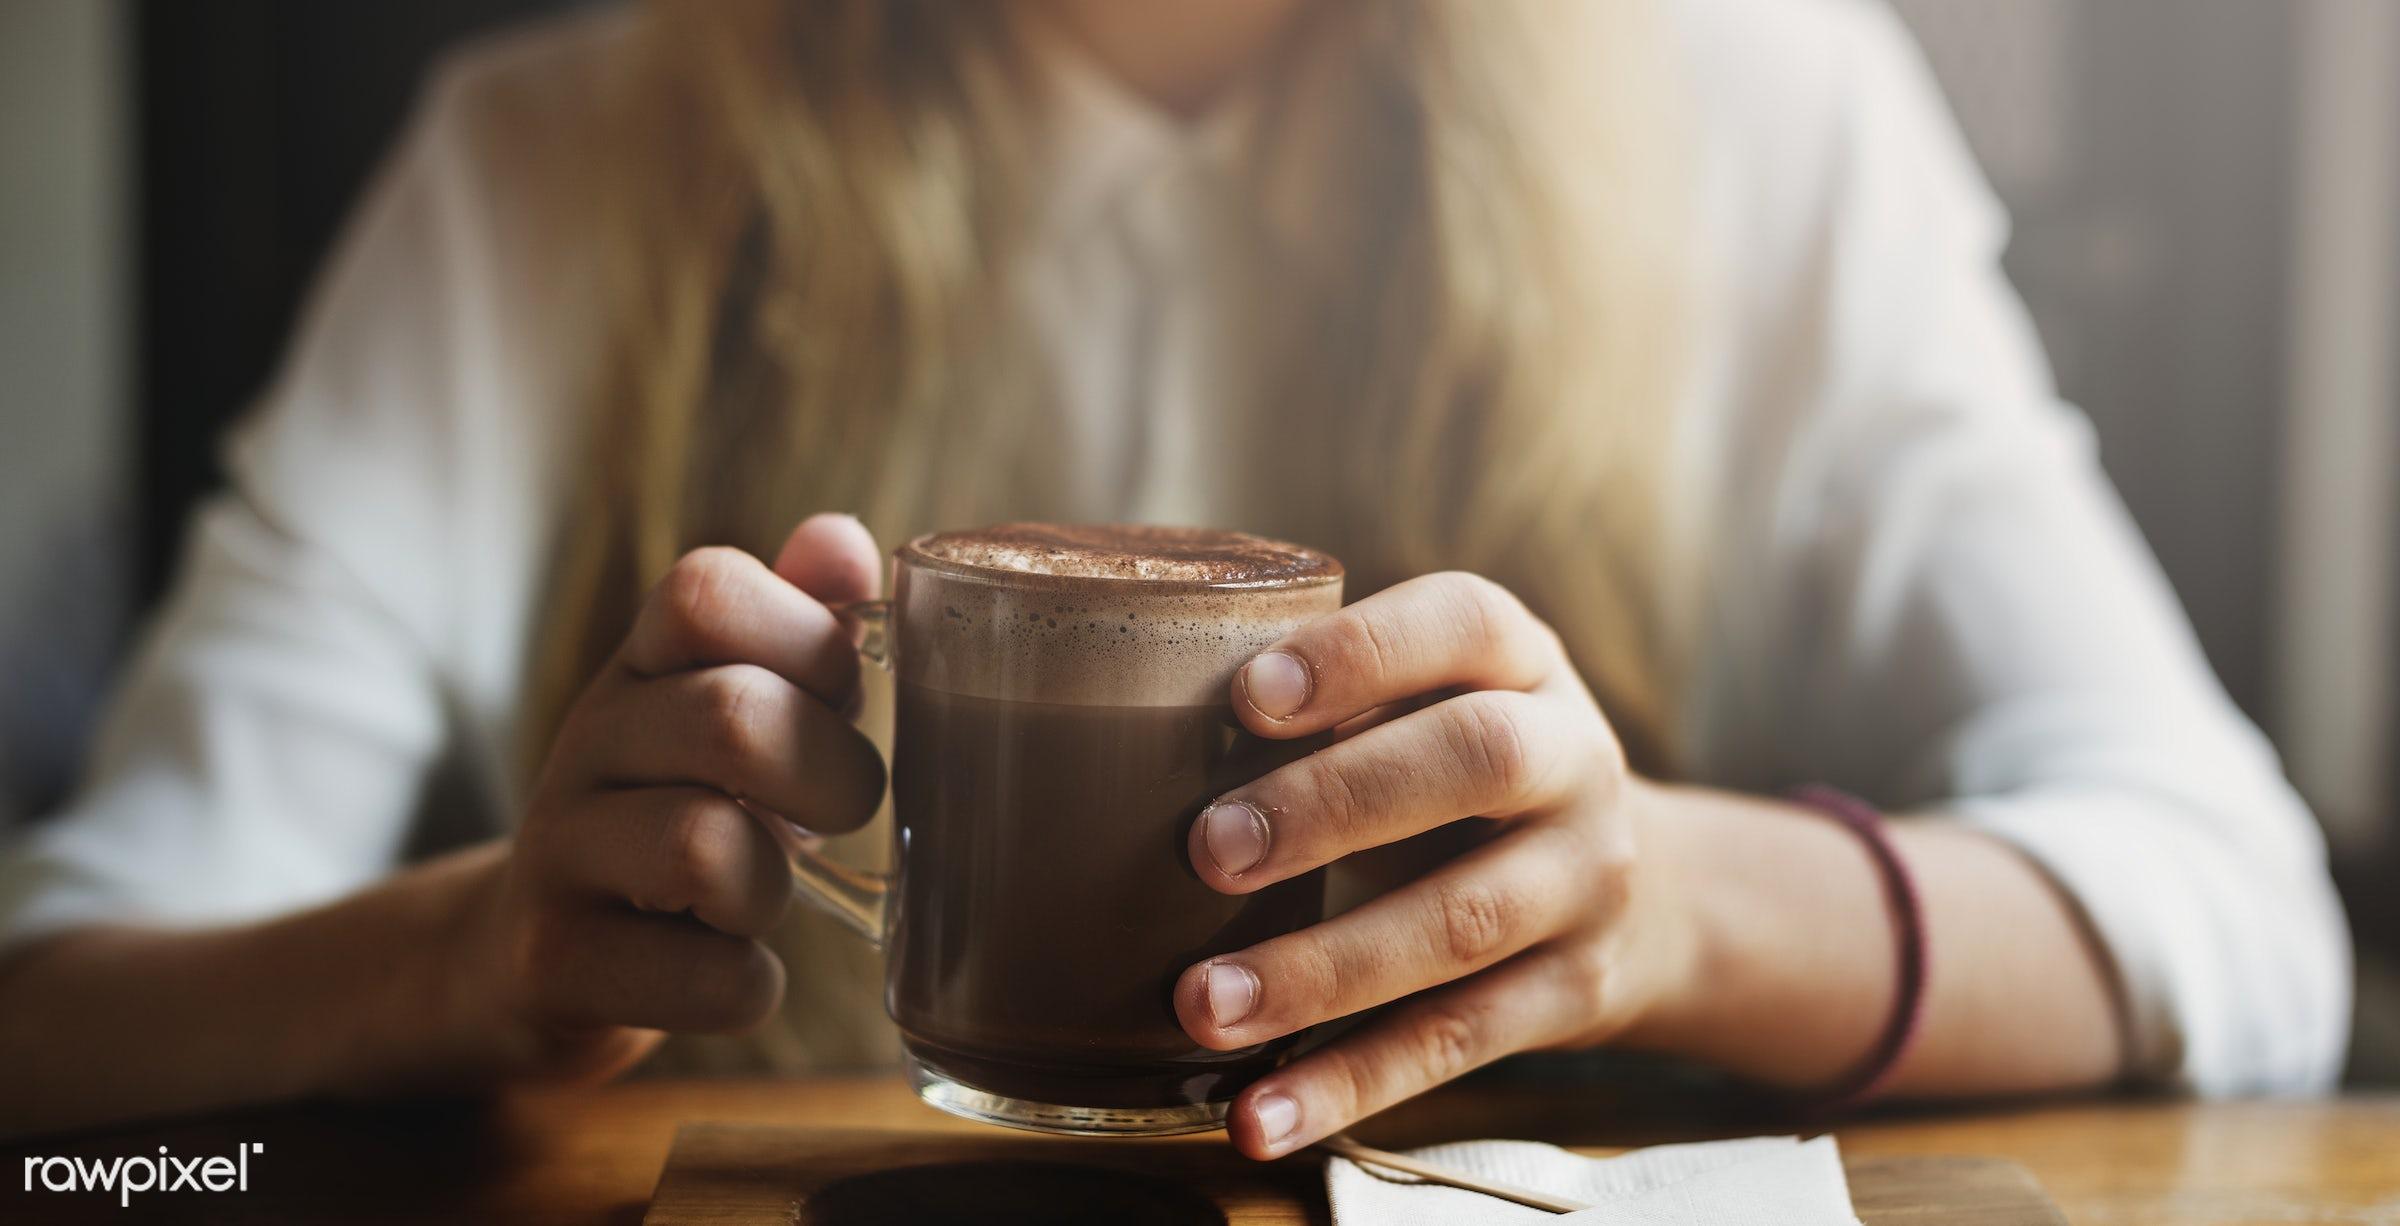 alone, beautiful, cafe, casual, cheerful, close-up, coffee, coffee shop, cute, drink, girl, happy, hobby, joy, joyful,...